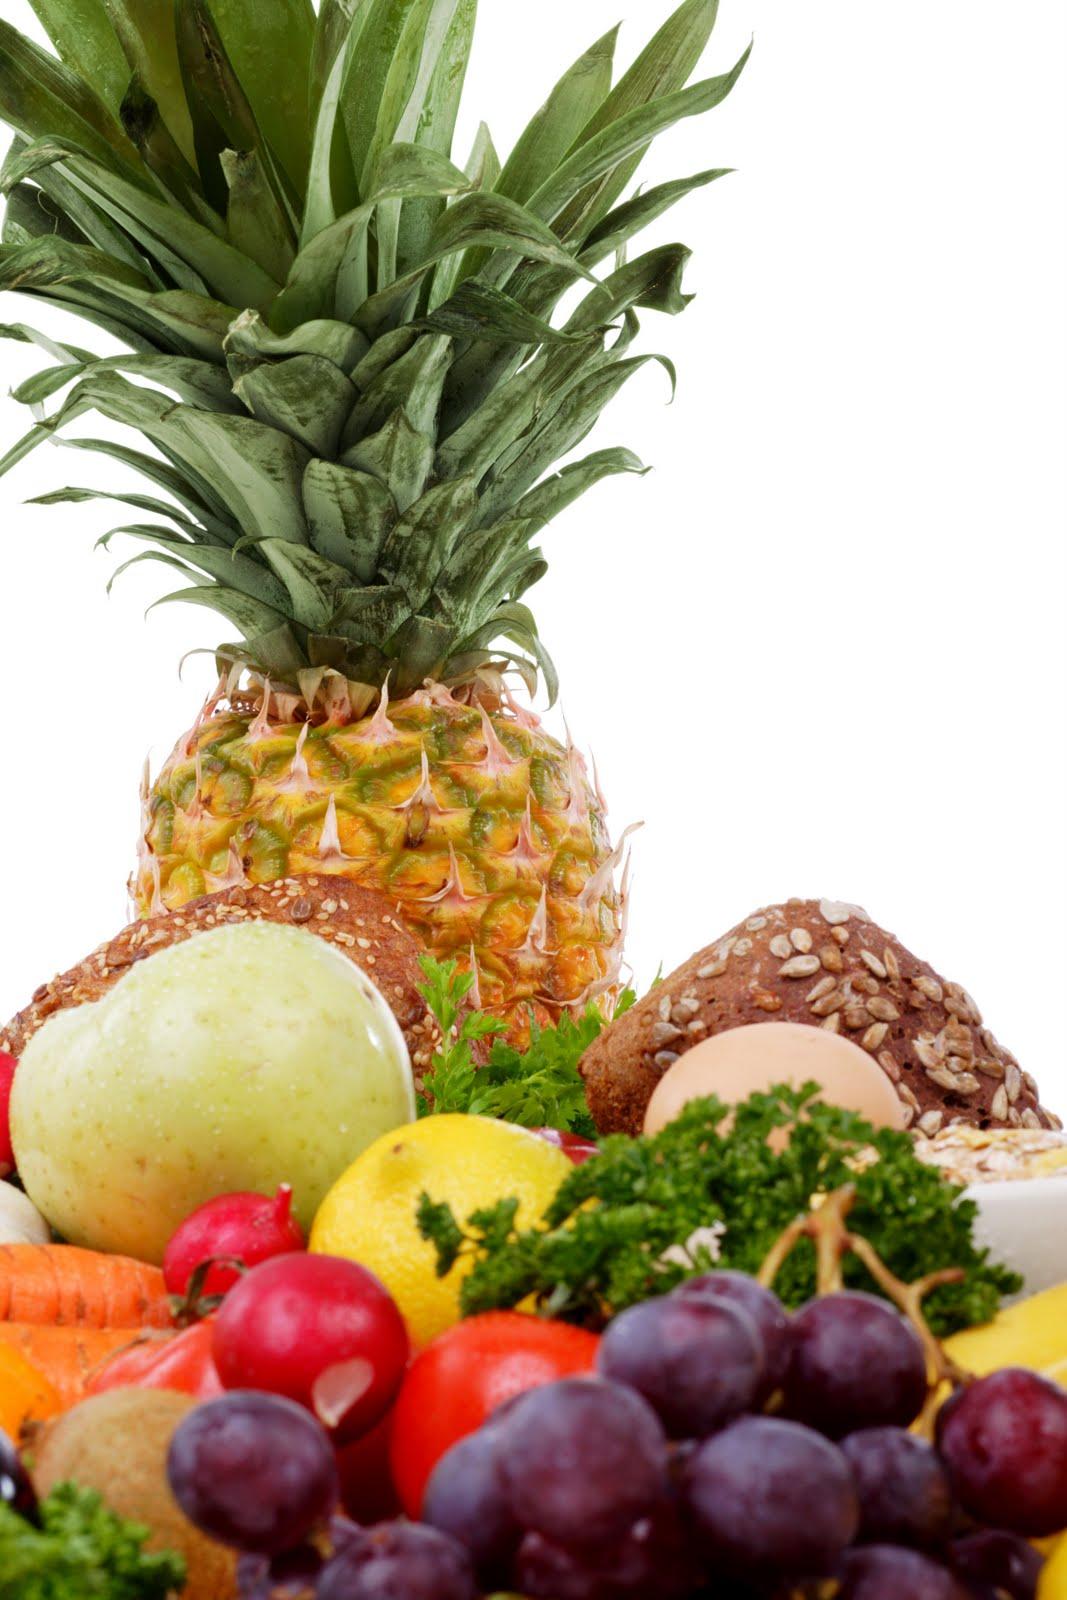 Estilite alimentos ricos en fibra - Alimentos que contengan fibra ...